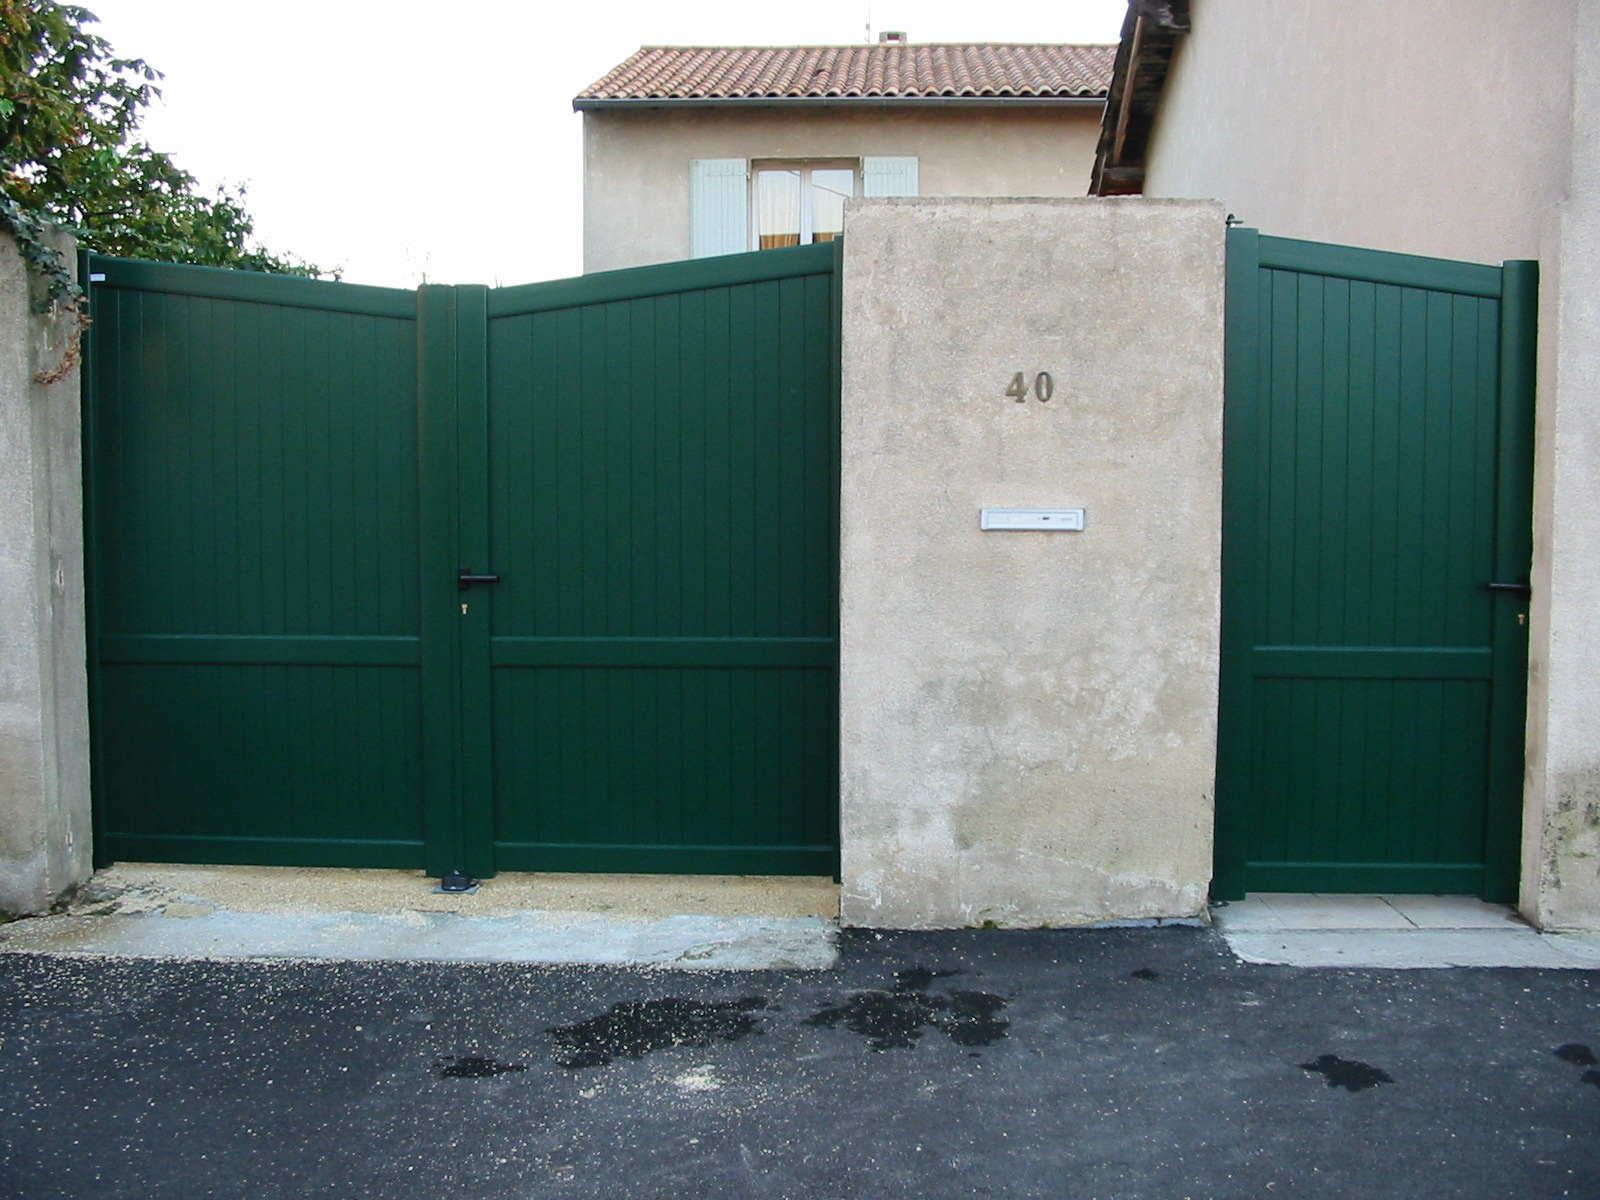 Portail et portillon en aluminium de chez KSM